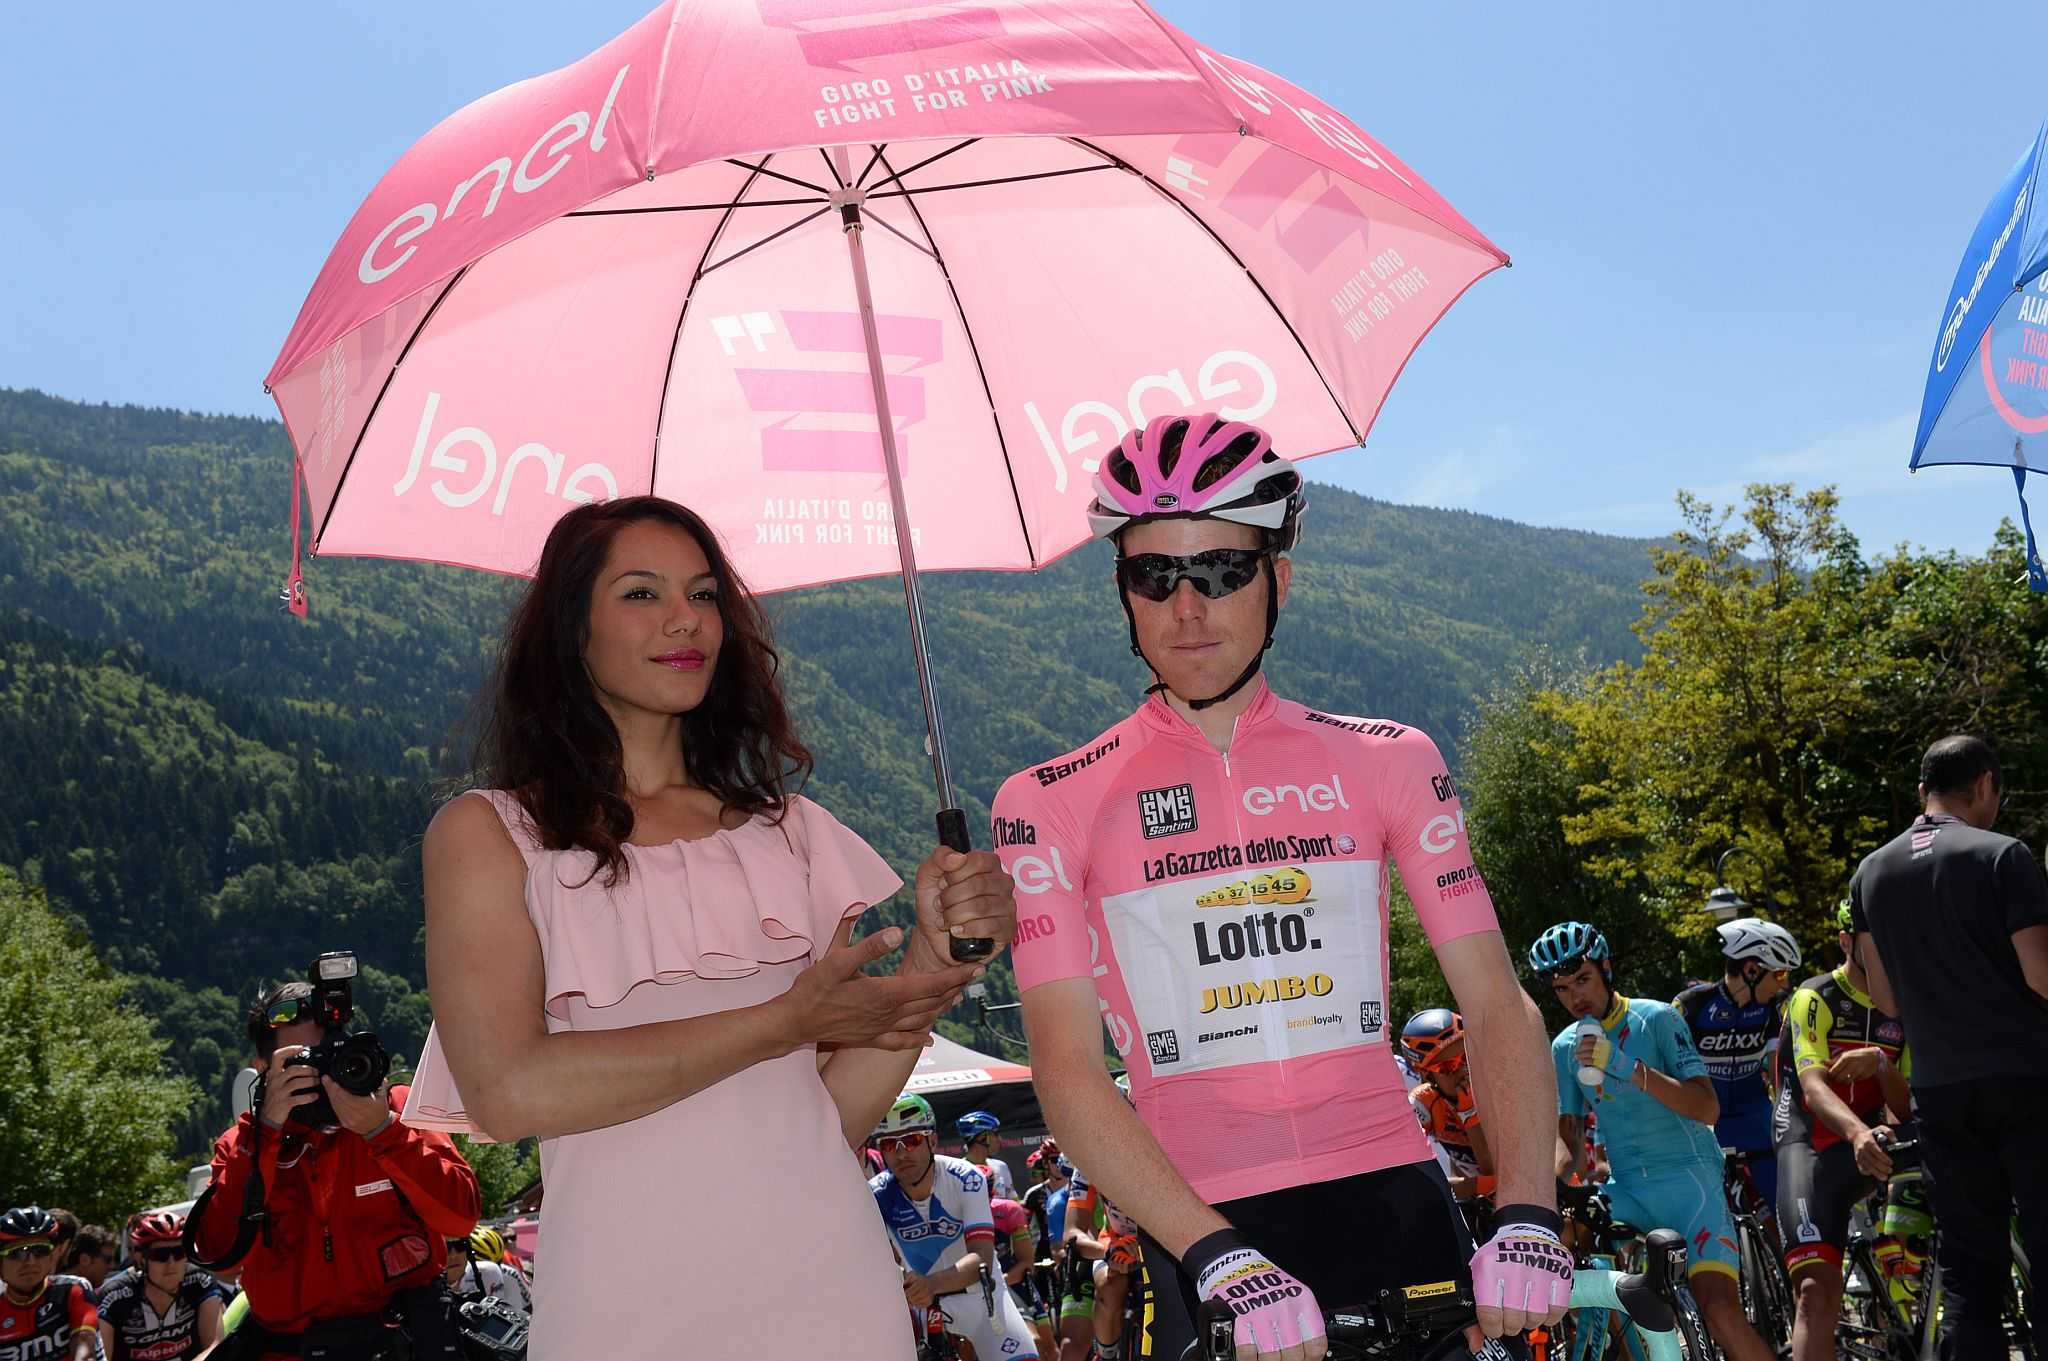 25-05-2016 Giro D'italia; Tappa 17 Molveno - Cassano D'adda; 2016, Lotto Nl - Jumbo; Kruijswijk, Steven;